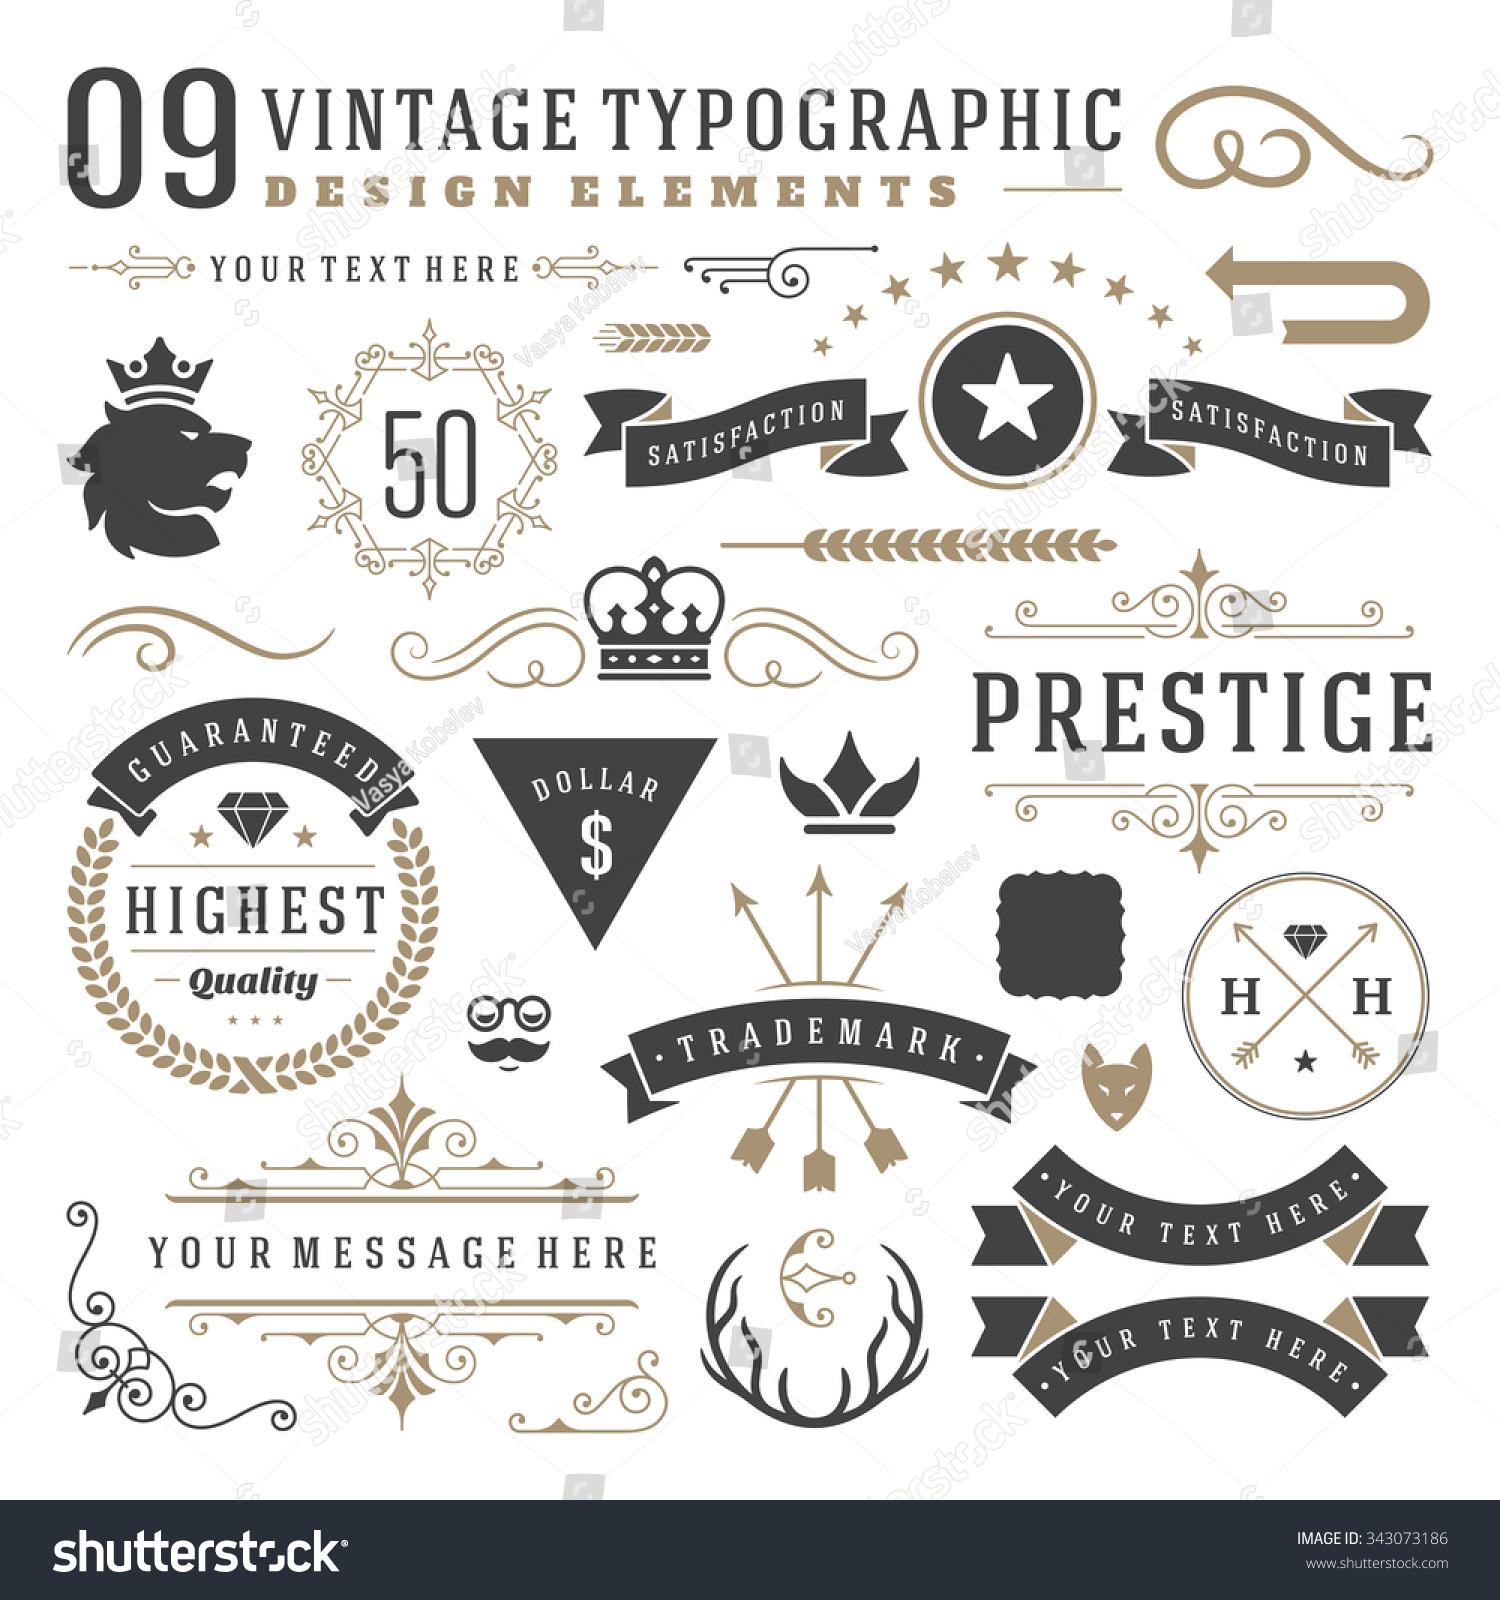 Retro Vintage Typographic Design Elements Arrows Stock Vector 343073186 - Shutterstock